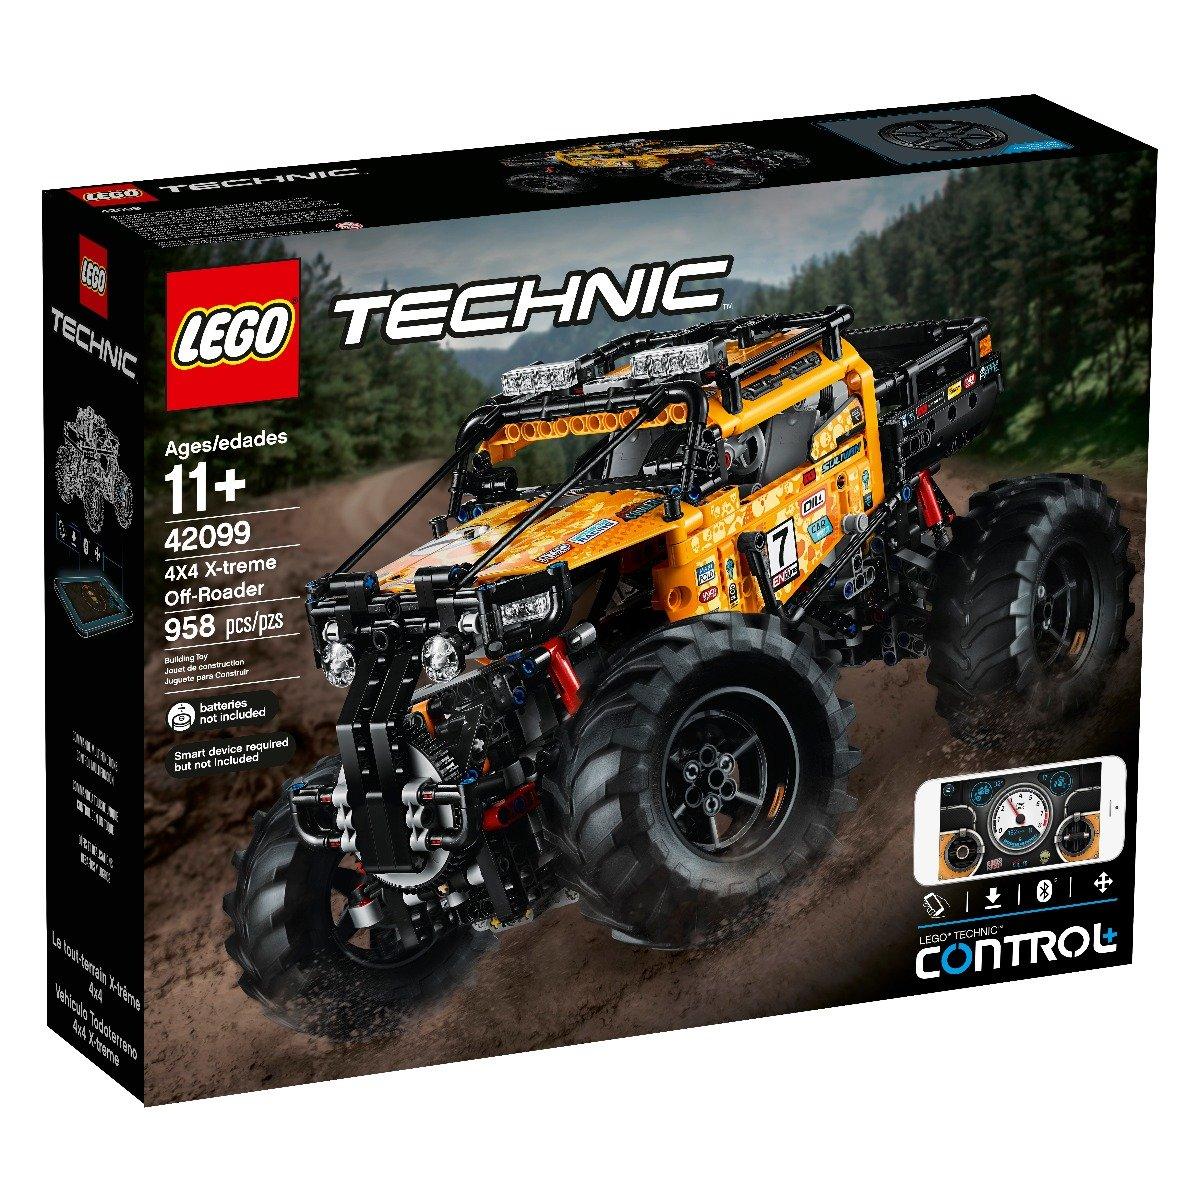 Lego® Technic - 4x4 X-treme Off Roader (42099)